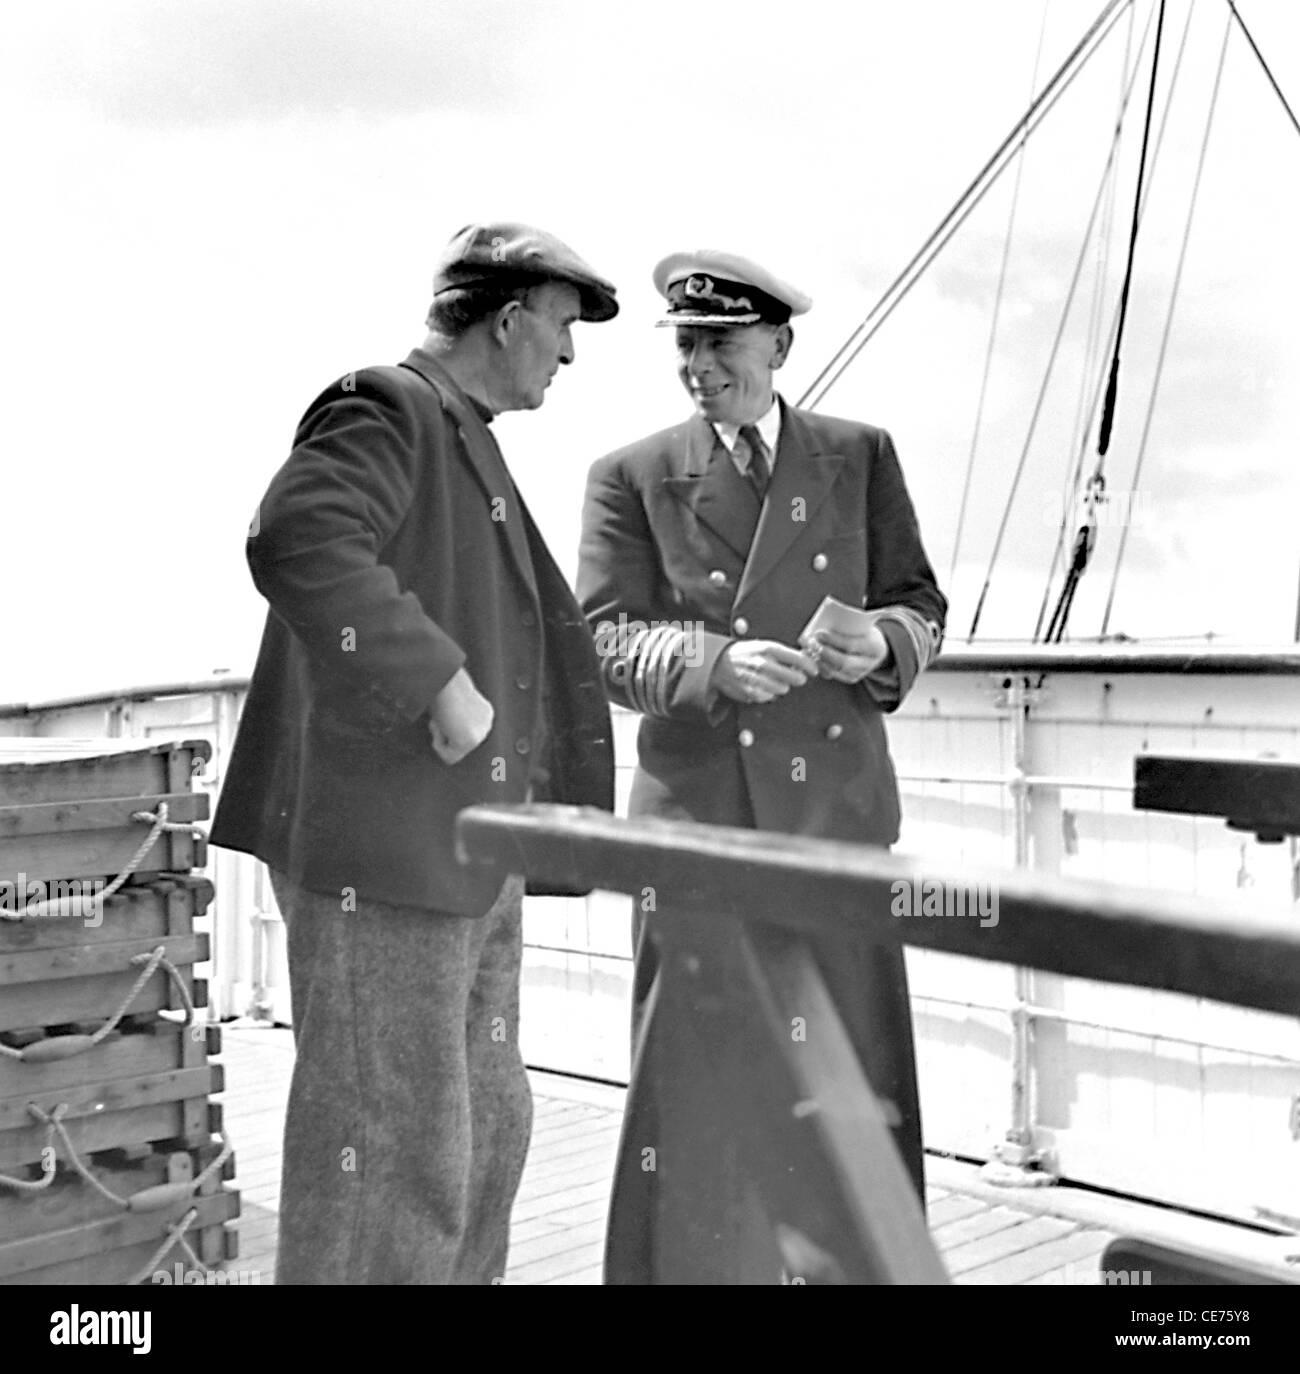 Islander Pat Hernon chats with Dun Angus skipper while docked at Kilronan pier Inis Mor  Aran Islands Co Galway - Stock Image